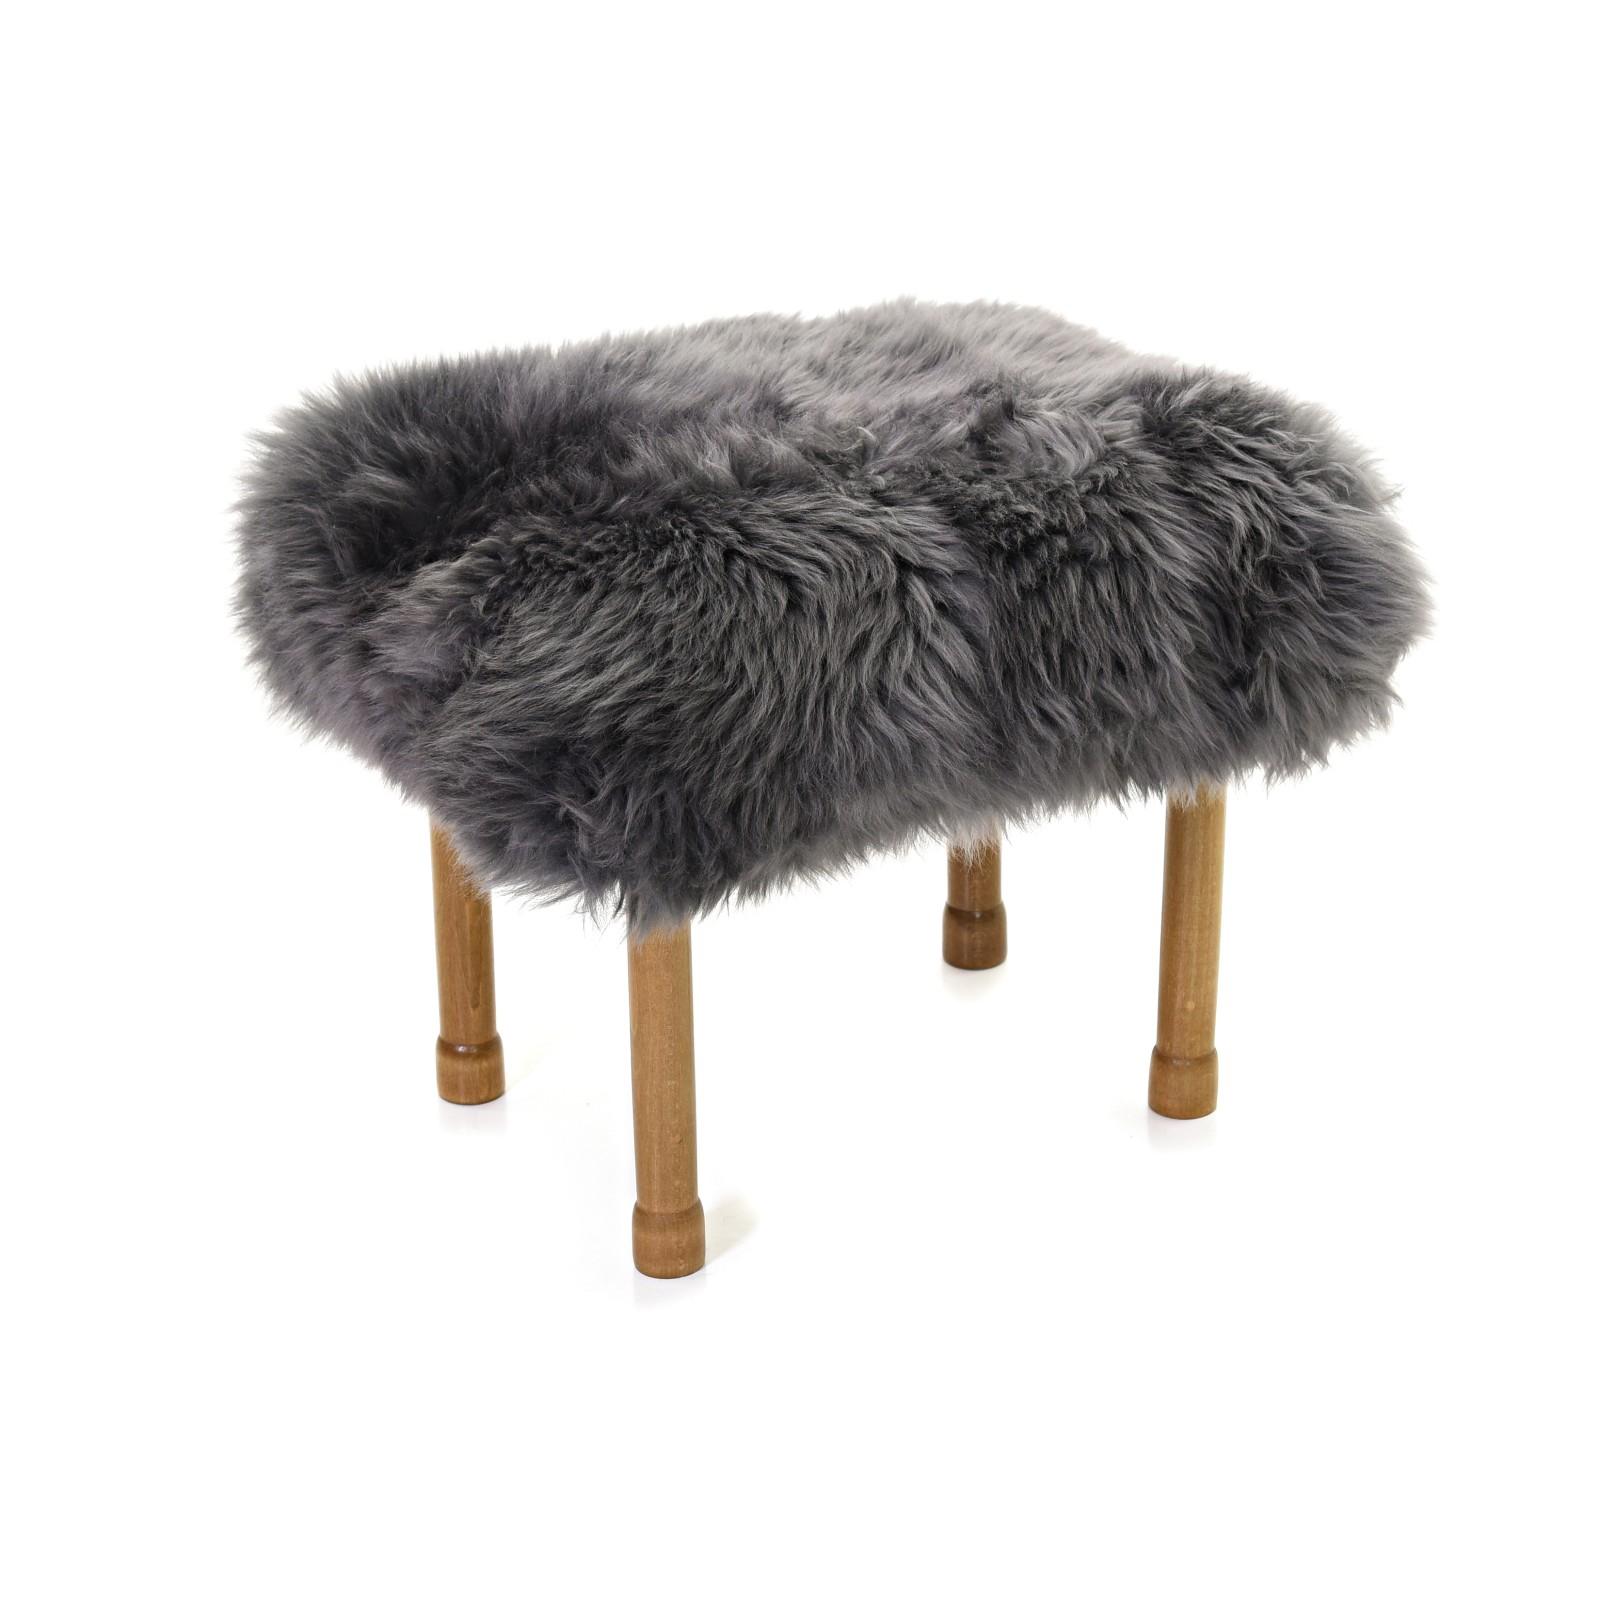 Myfanwy - Sheepskin Footstool Slate Grey